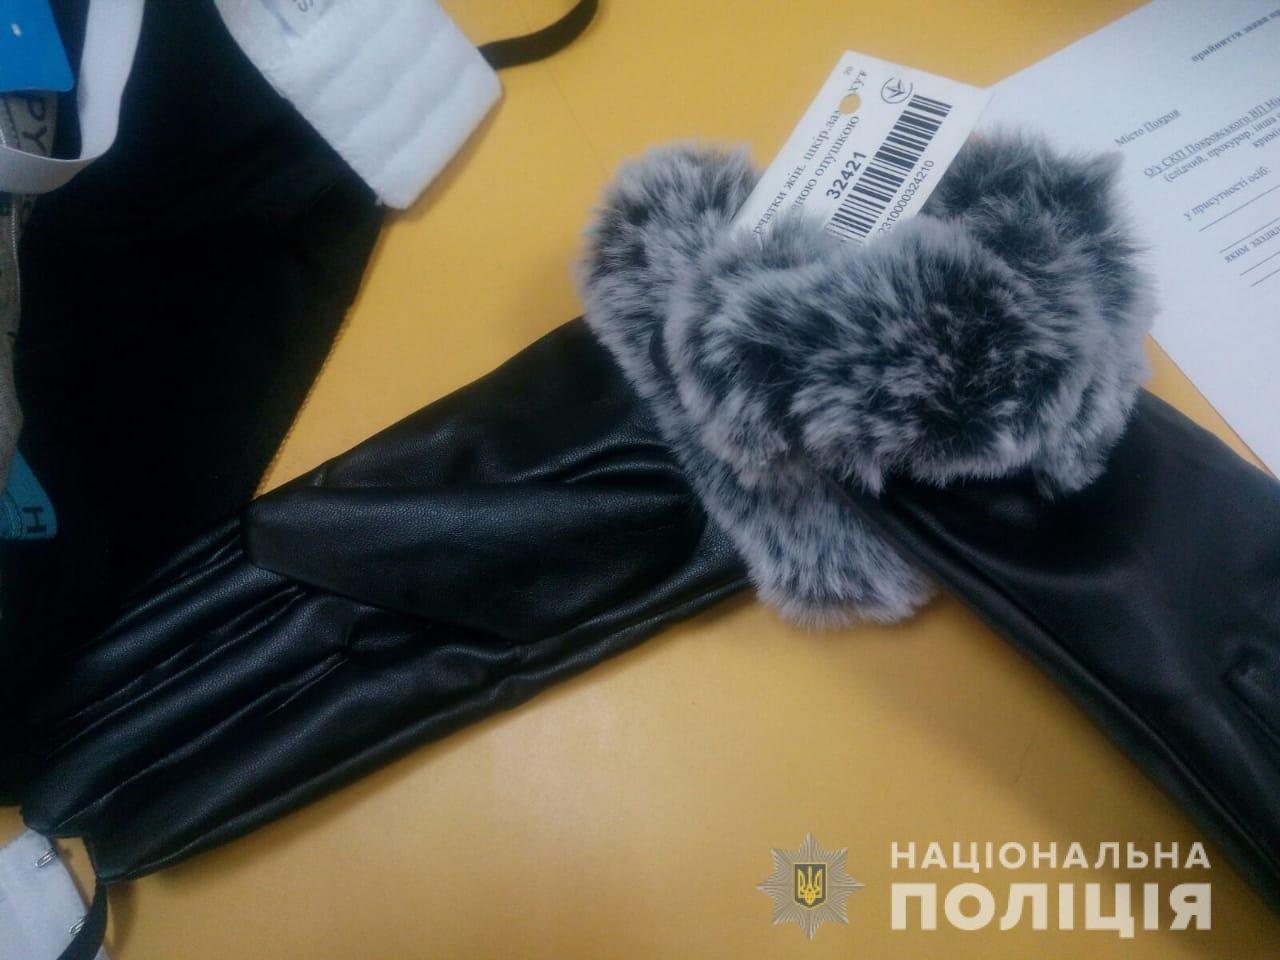 На Днепропетровщине 18-летний парень крал вещи из магазина, пряча их под одежду, - ФОТО, фото-2